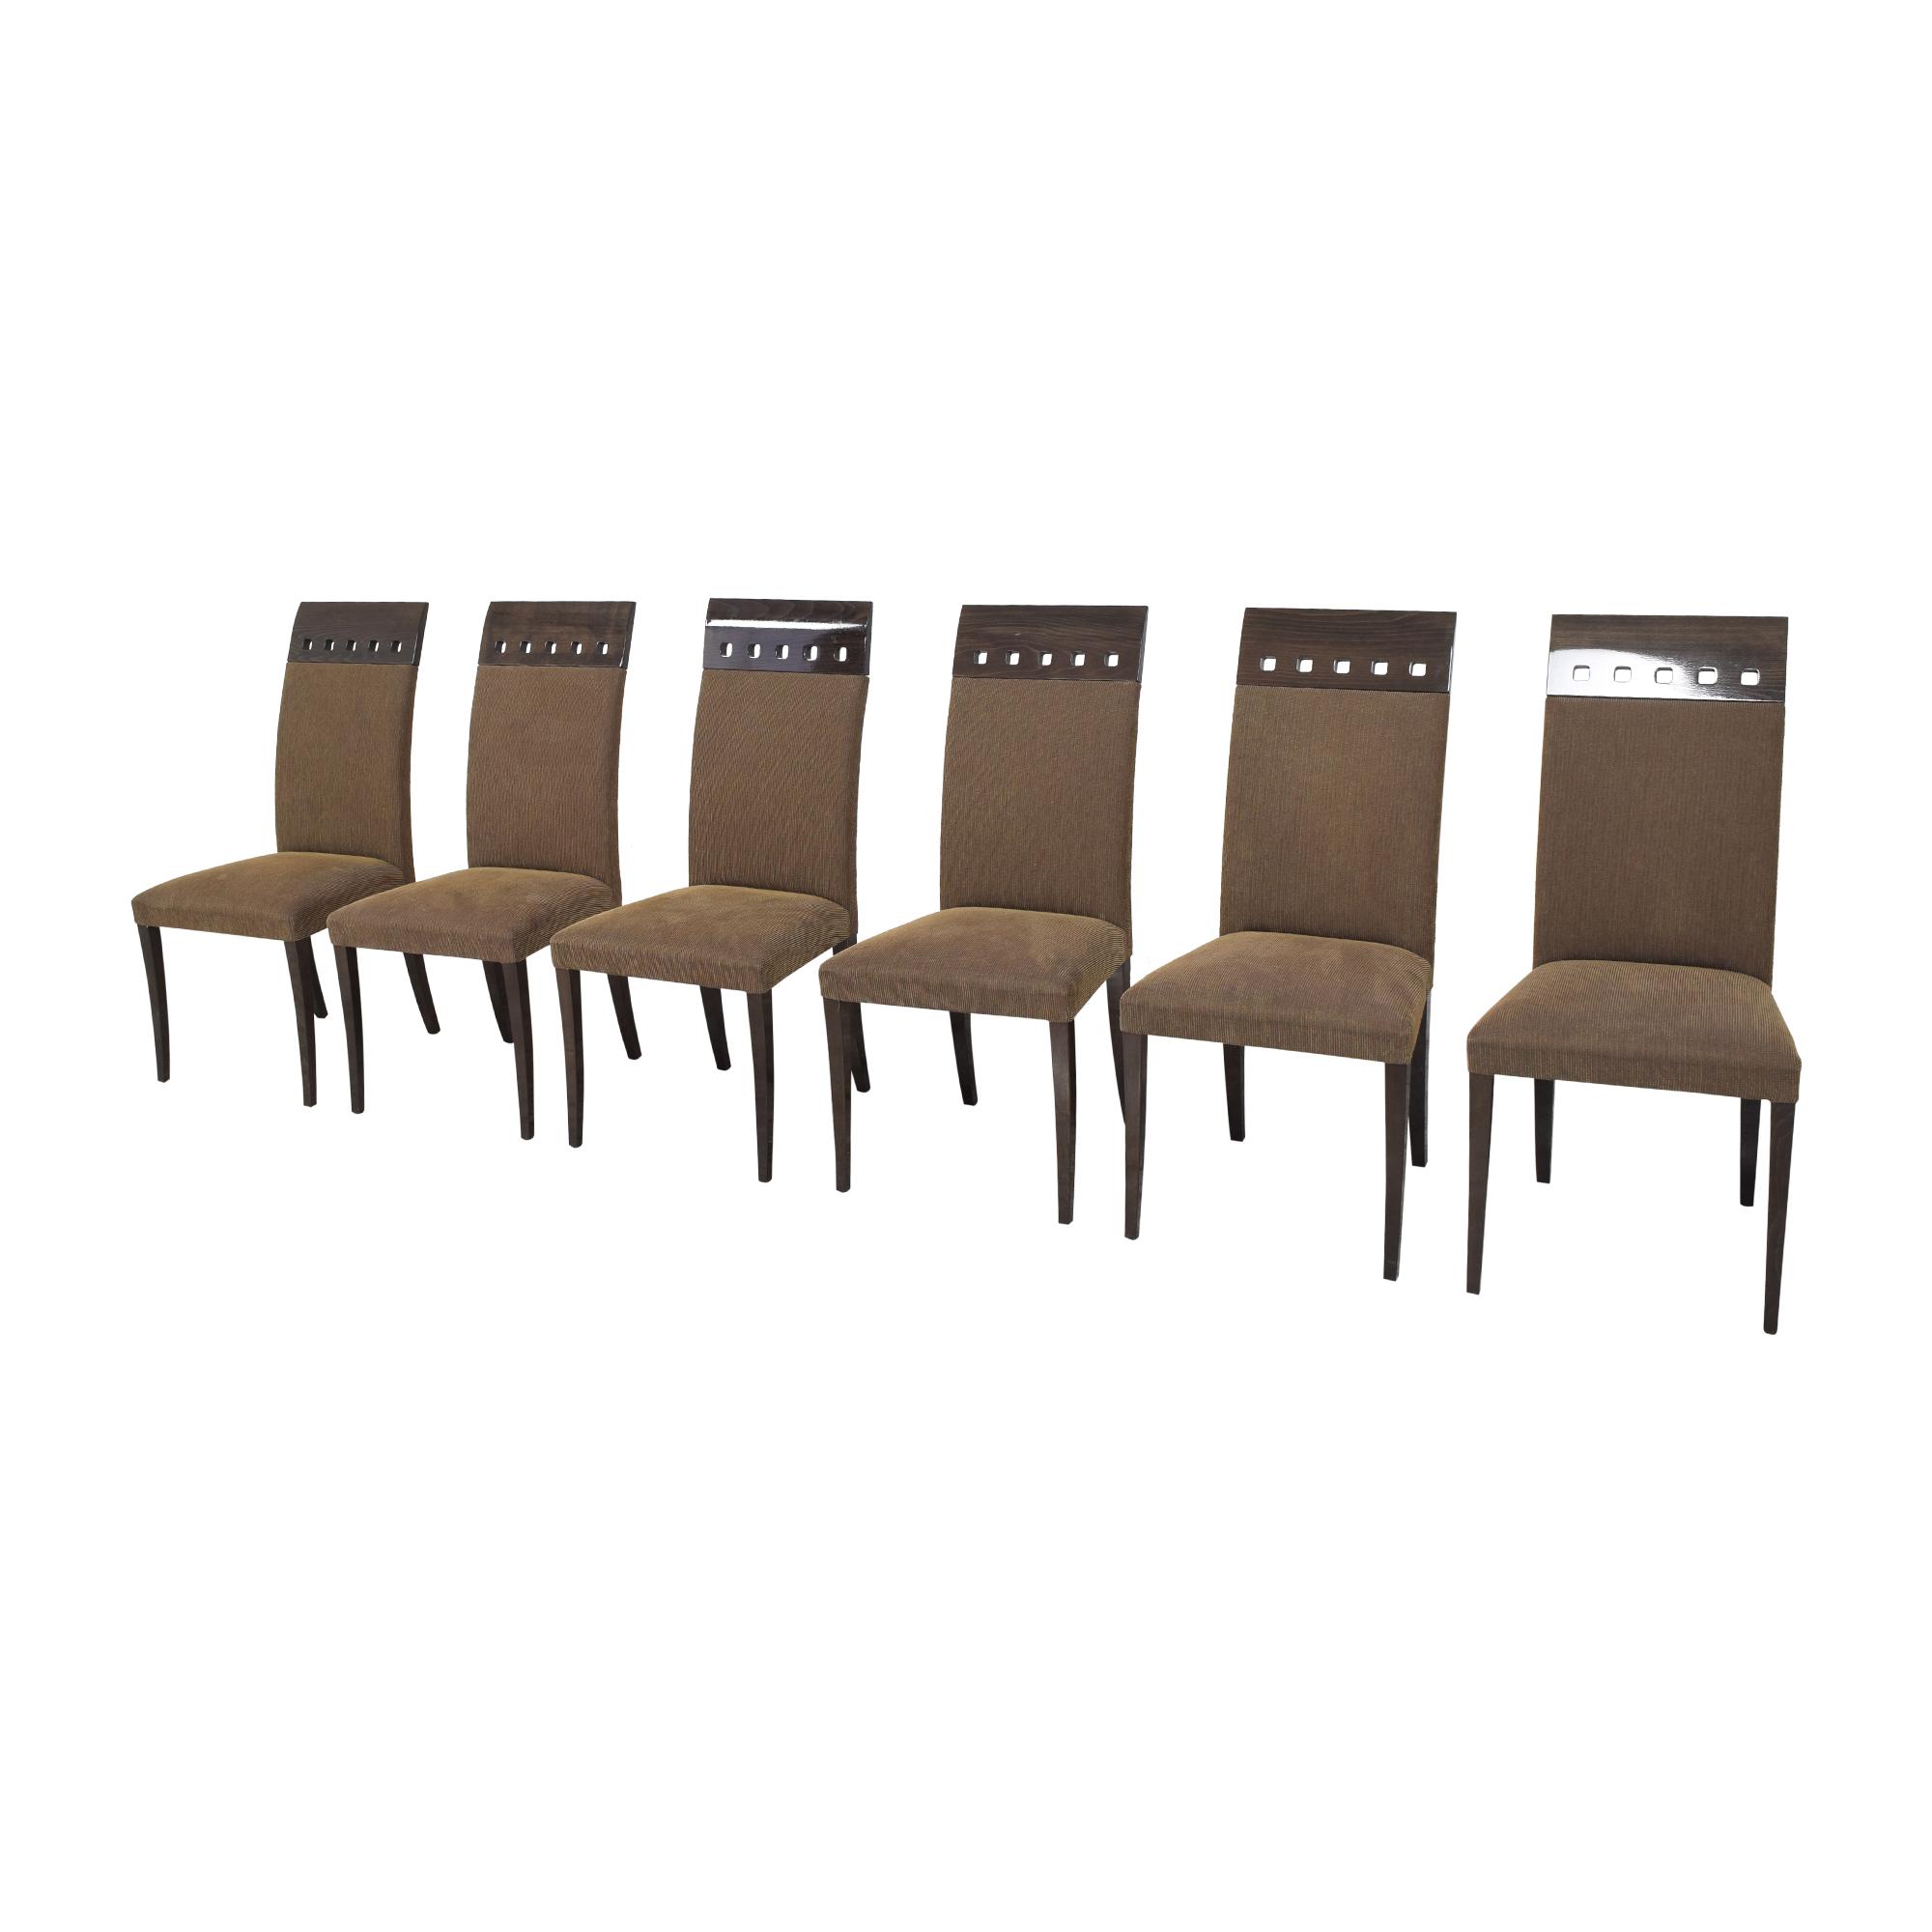 Pietro Costantini Pietro Costantini Waldorf Dining Side Chairs used